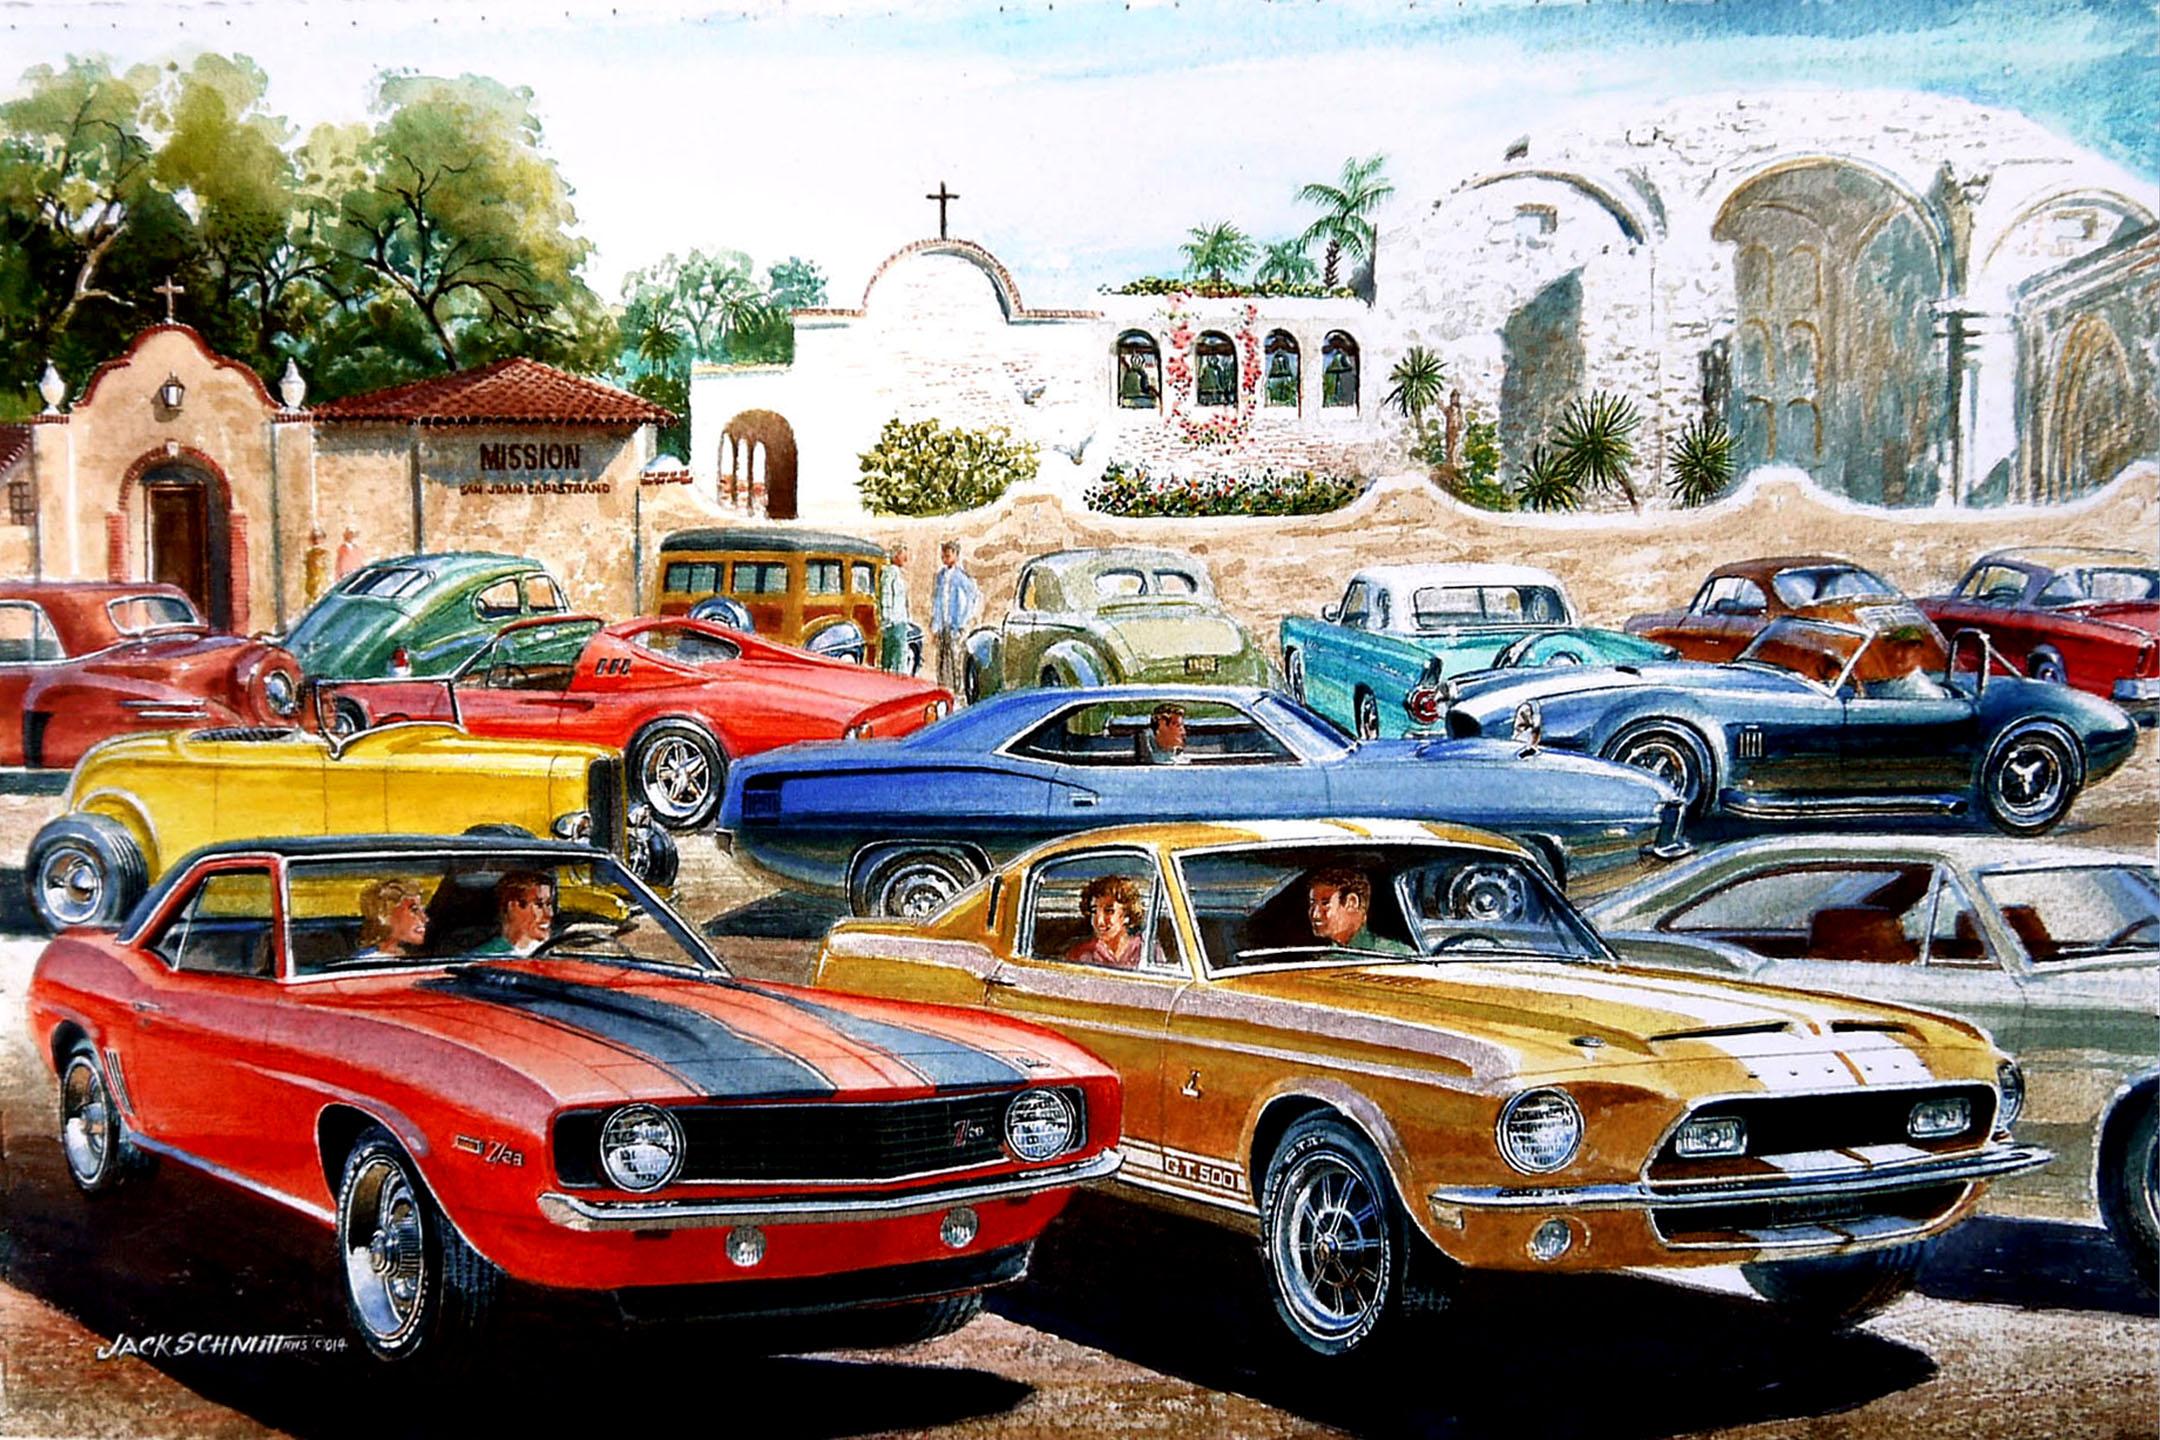 Historic Car Show Returns To San Juan Capistrano The Capistrano